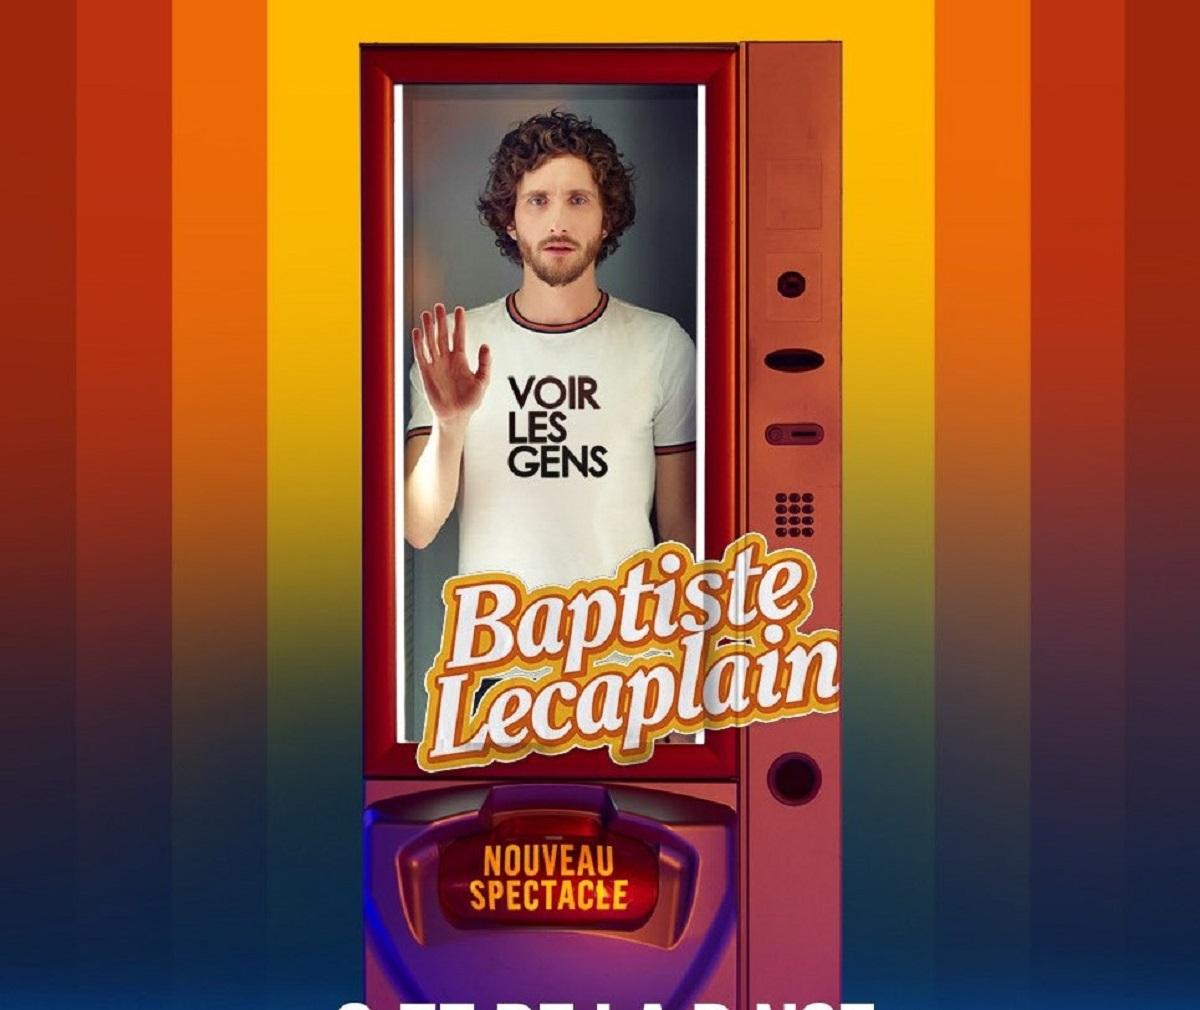 rennes-spectacle-baptiste-lecaplain